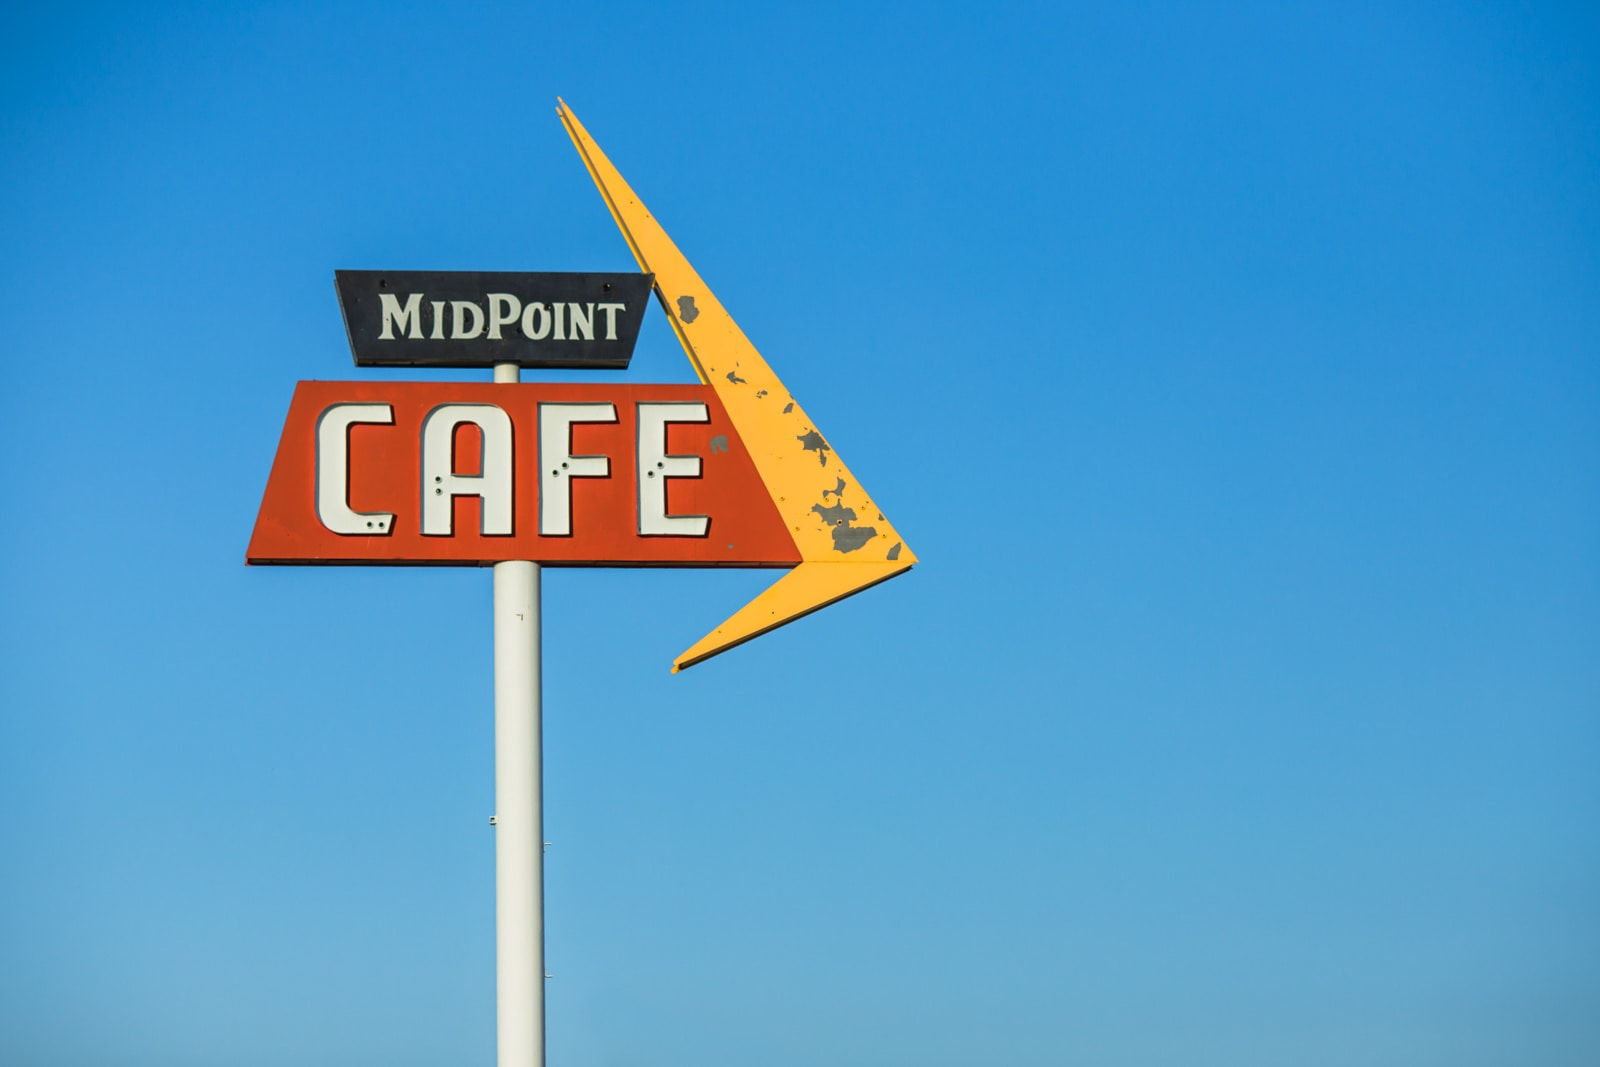 Midpoint Cafe vintage road sign